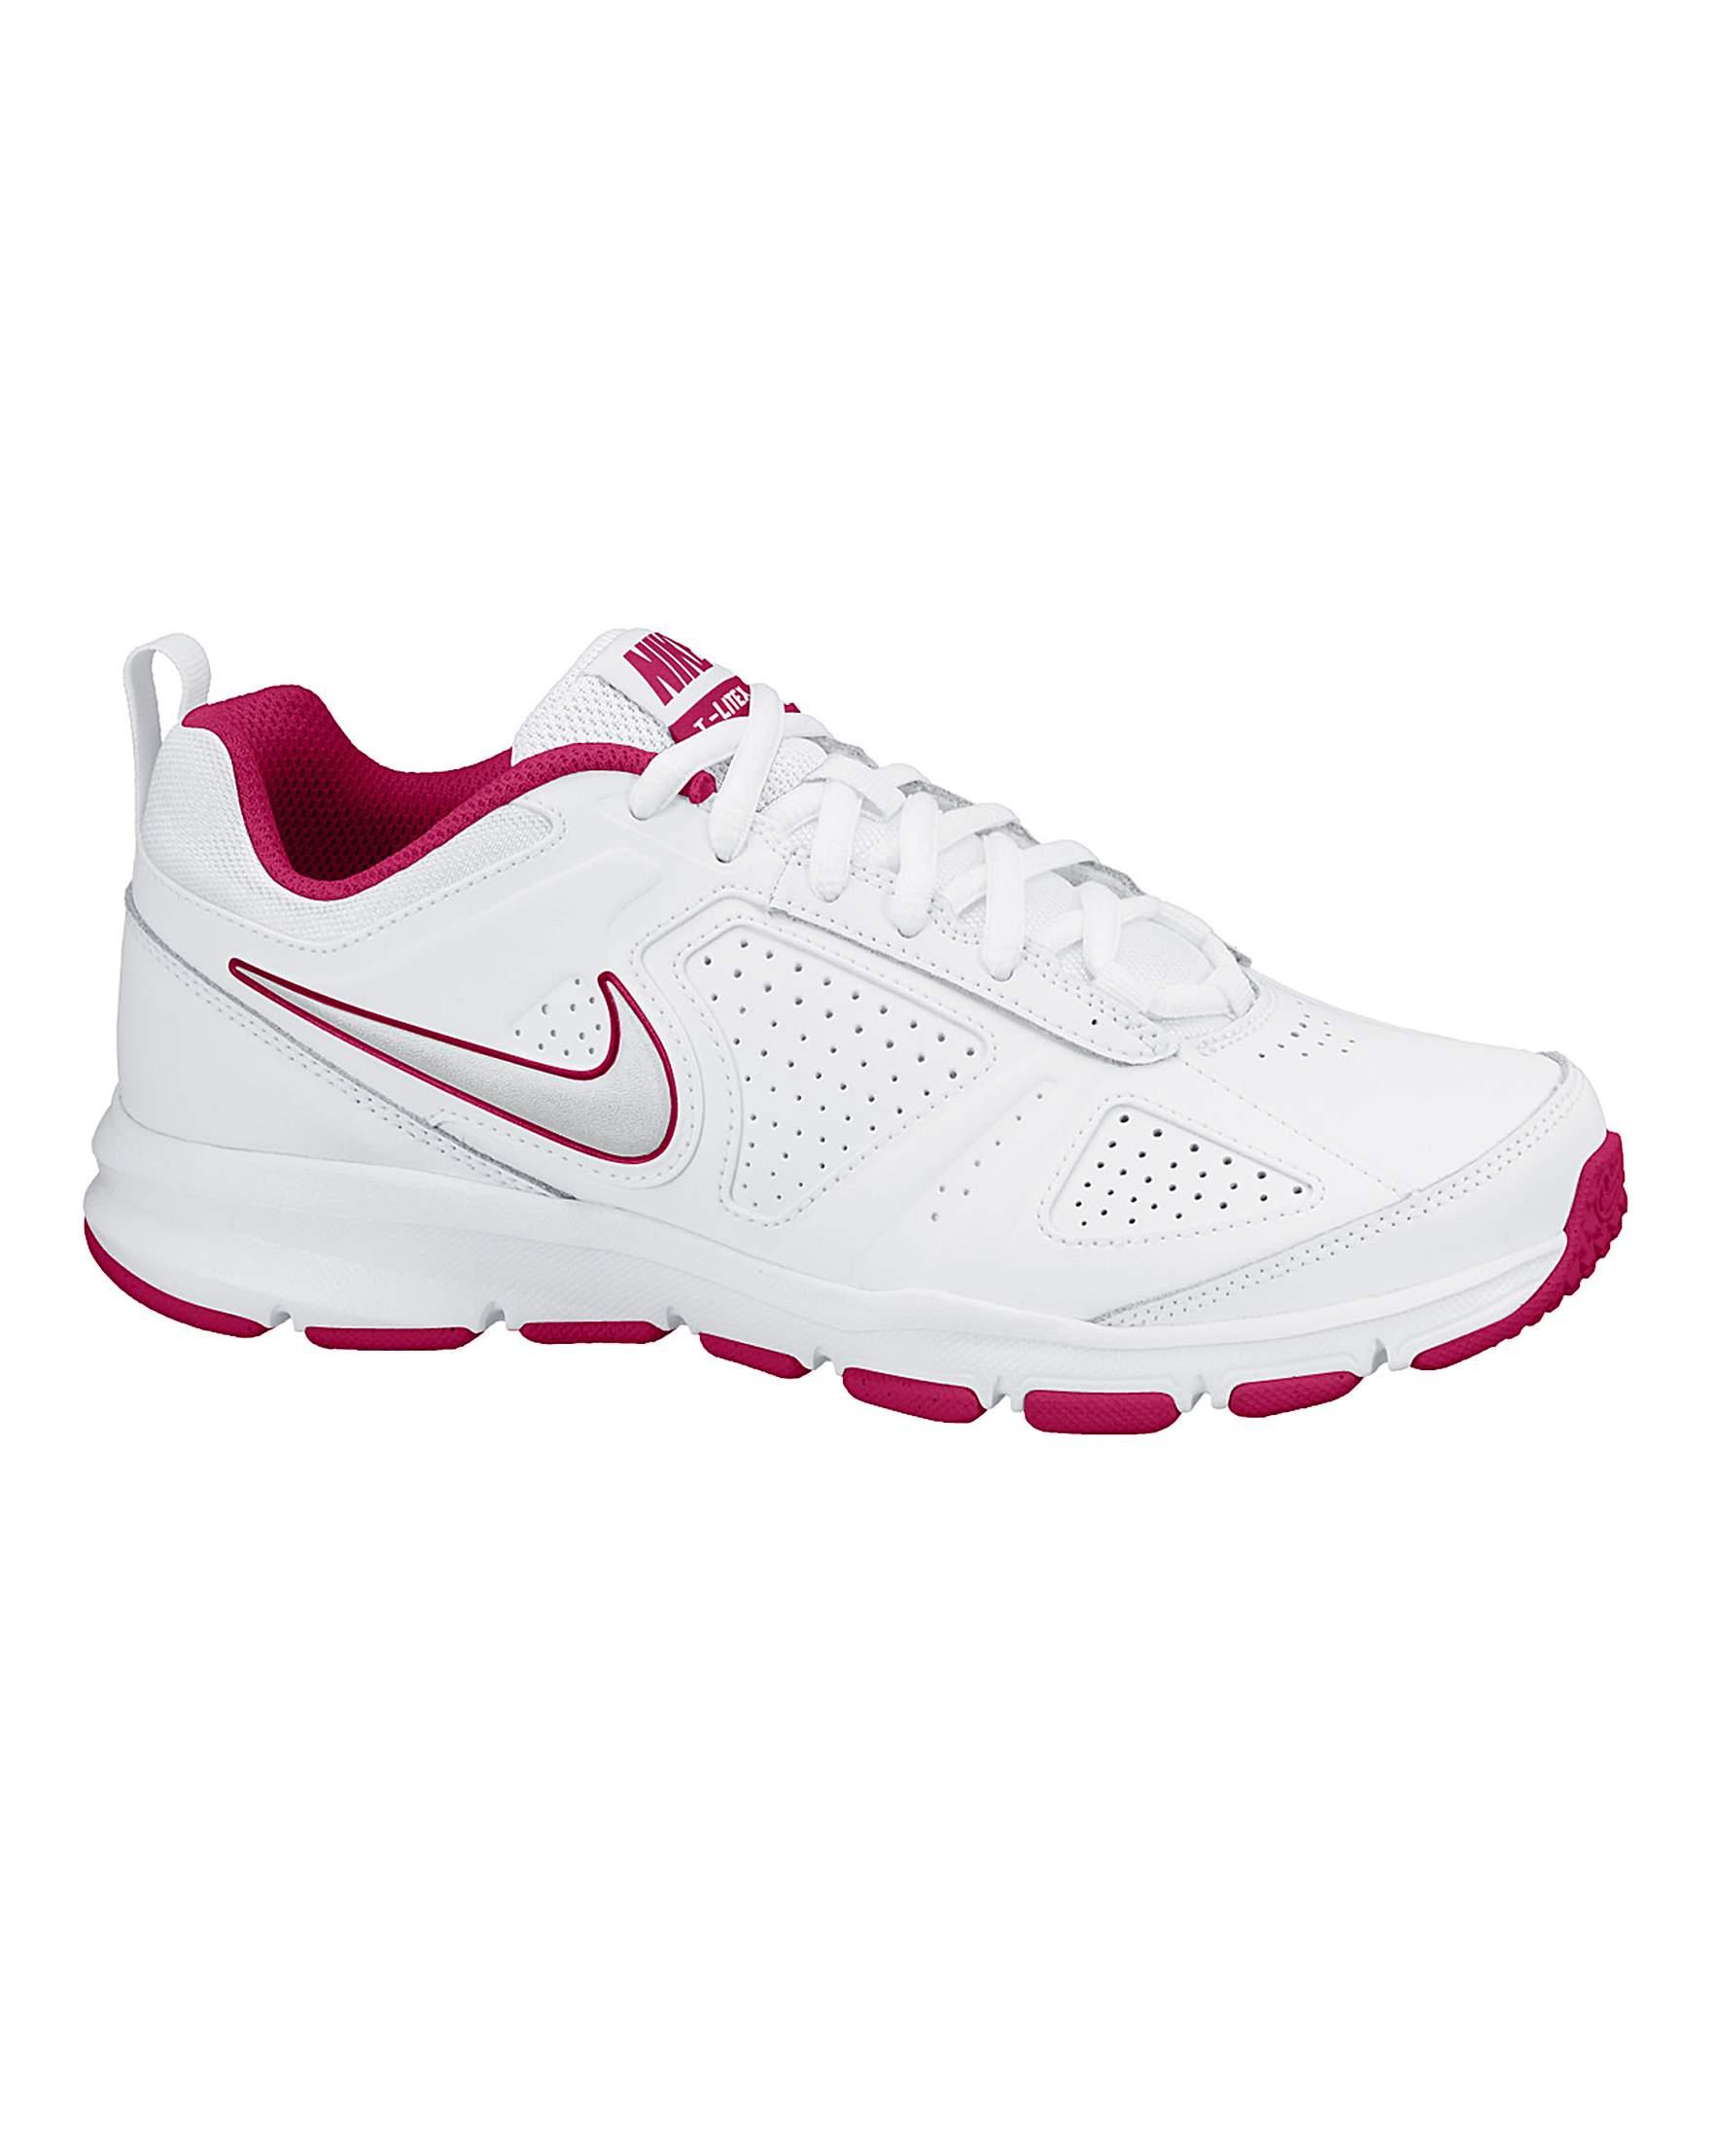 Nike trainers t lite xi women s sneakers sports runing shoes black - Nike Trainers T Lite Xi Women S Sneakers Sports Runing Shoes Black 36